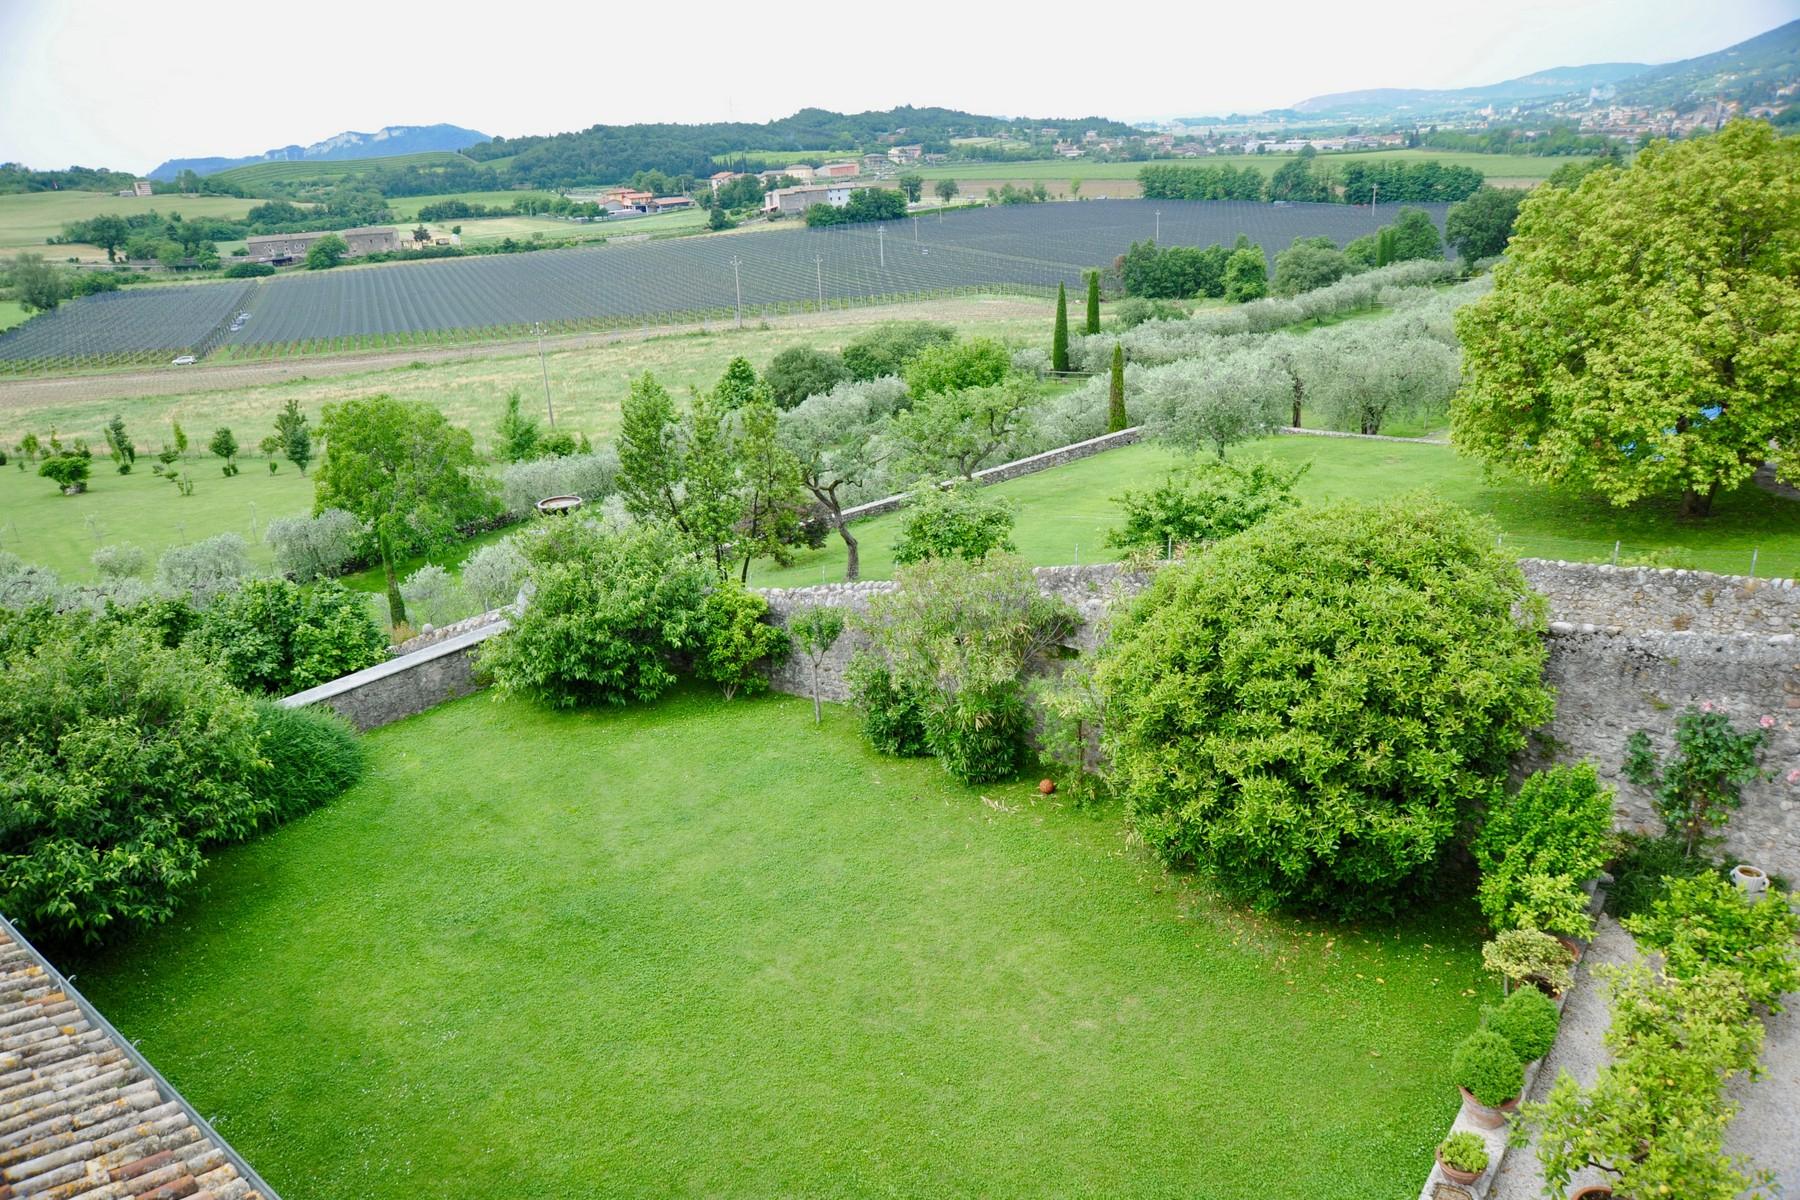 Villa in Vendita a Verona: 5 locali, 450 mq - Foto 11